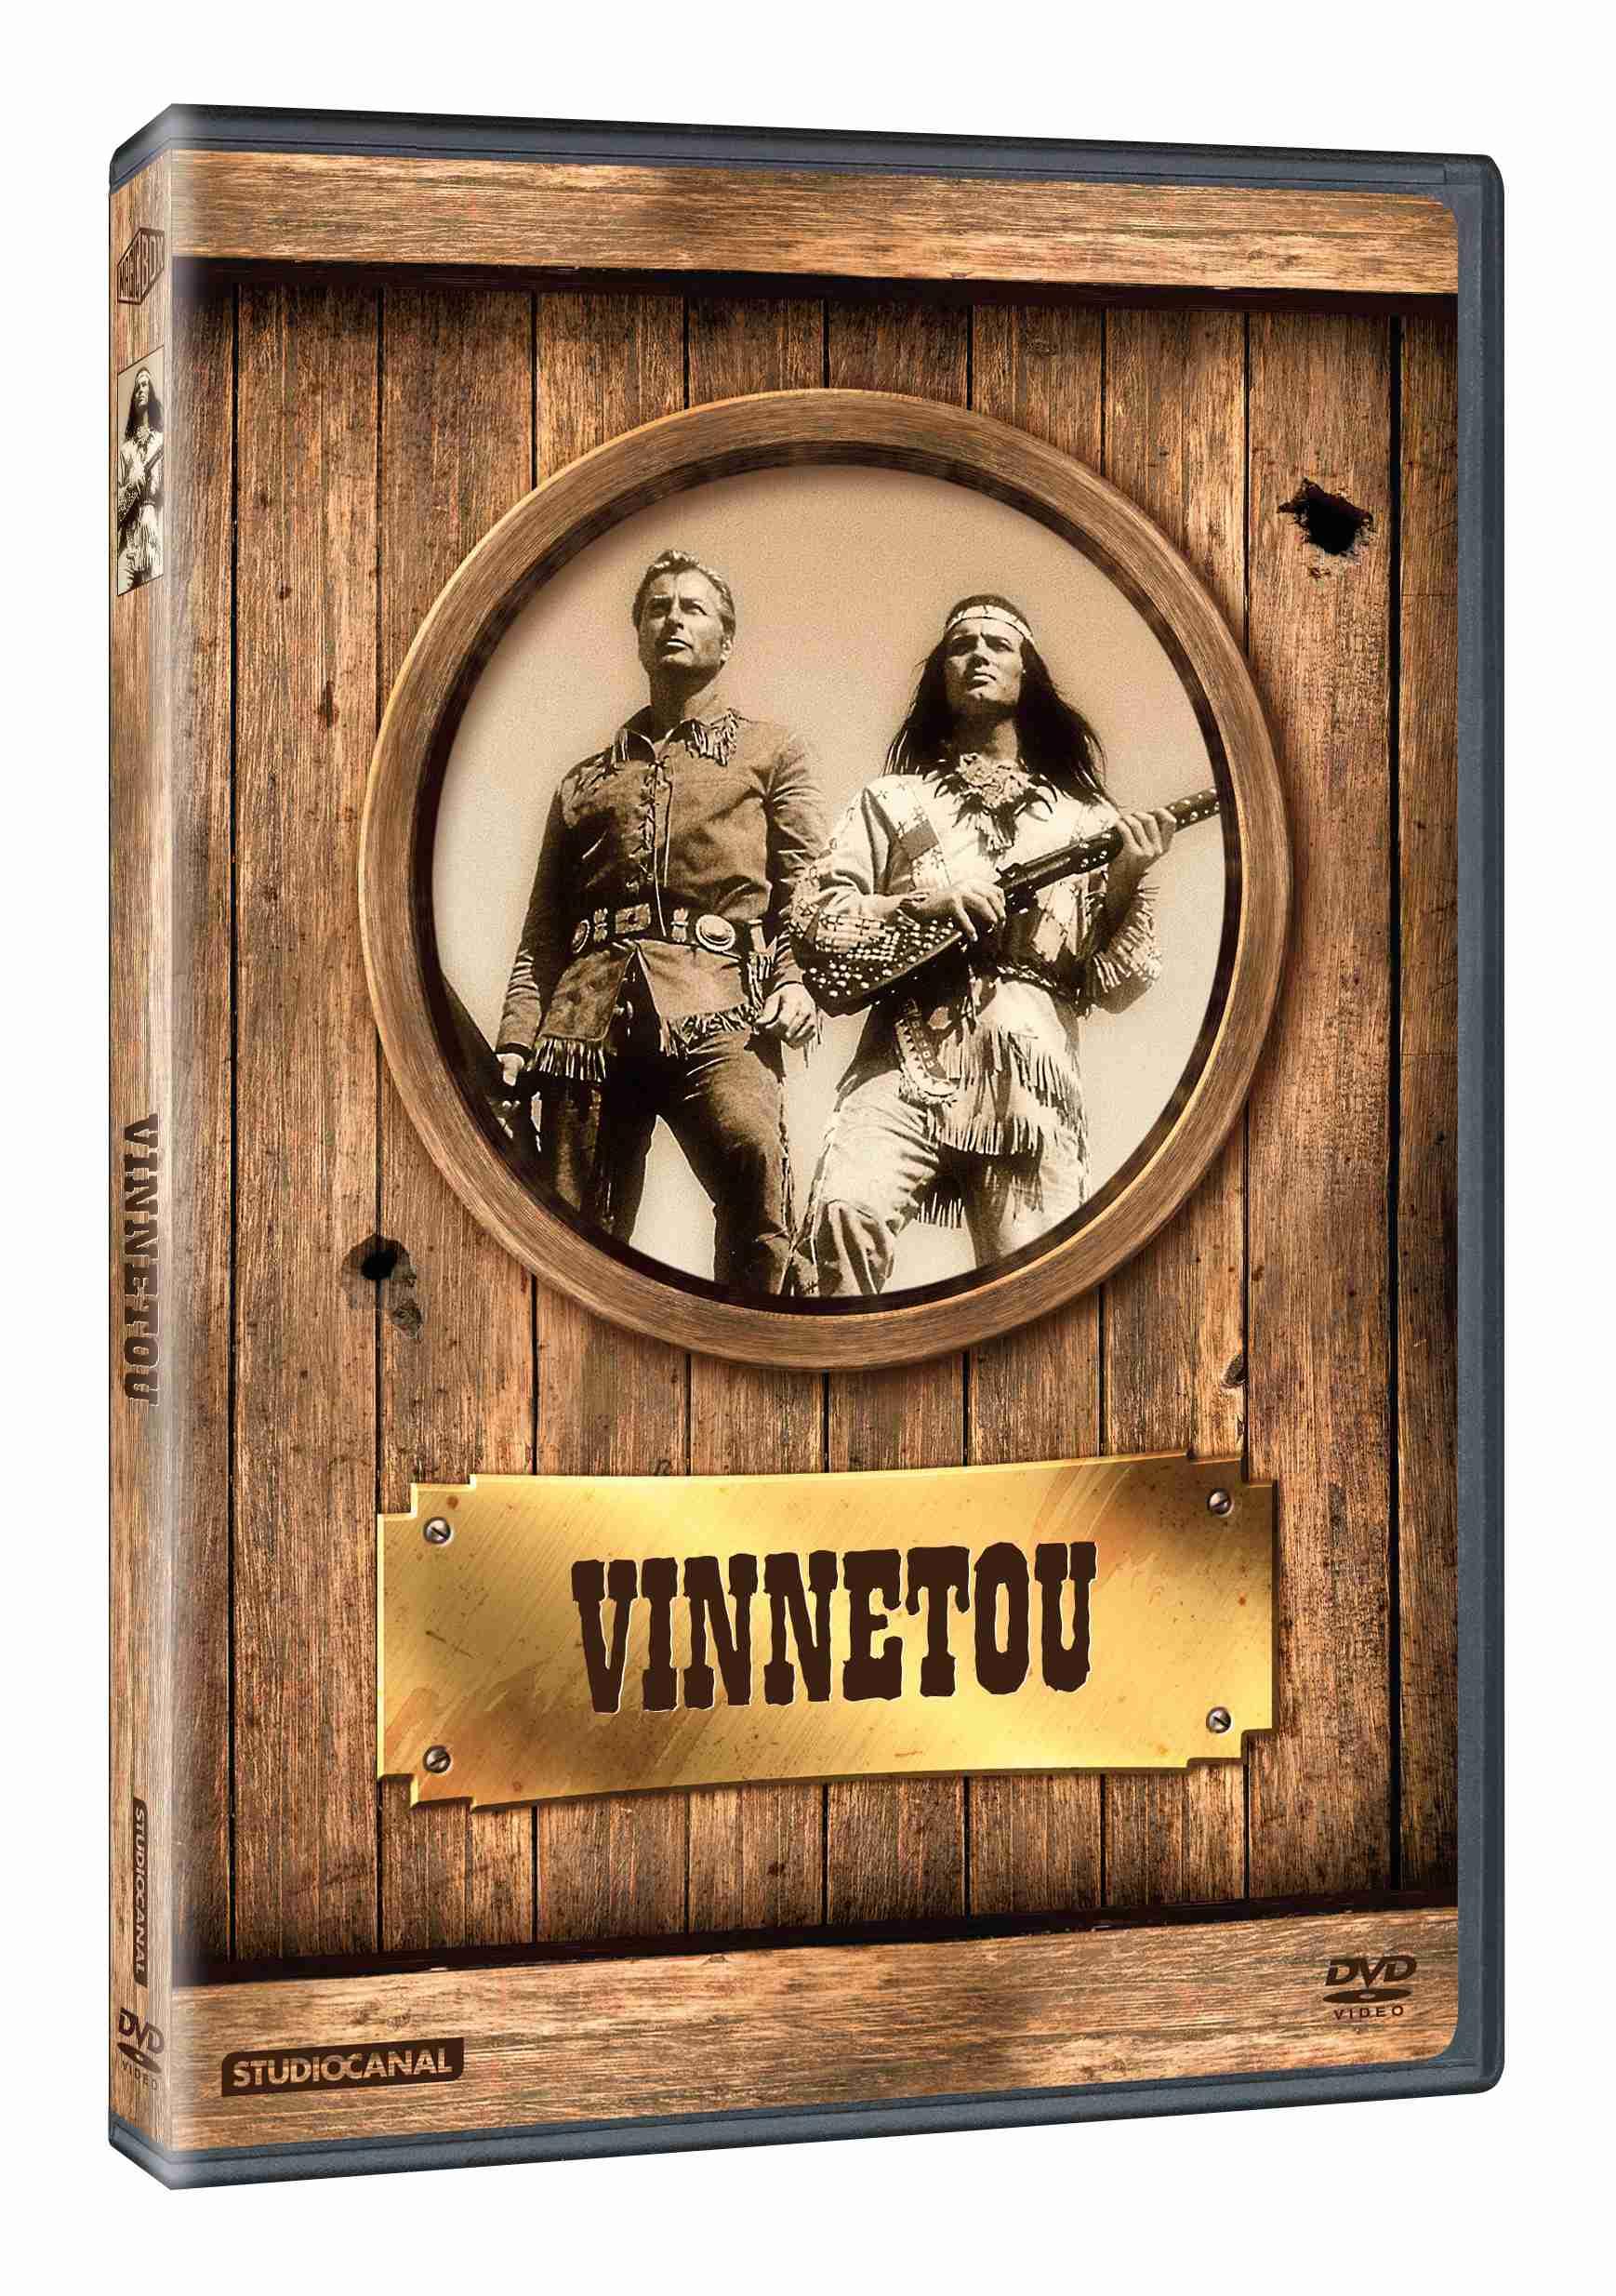 VINNETOU - DVD